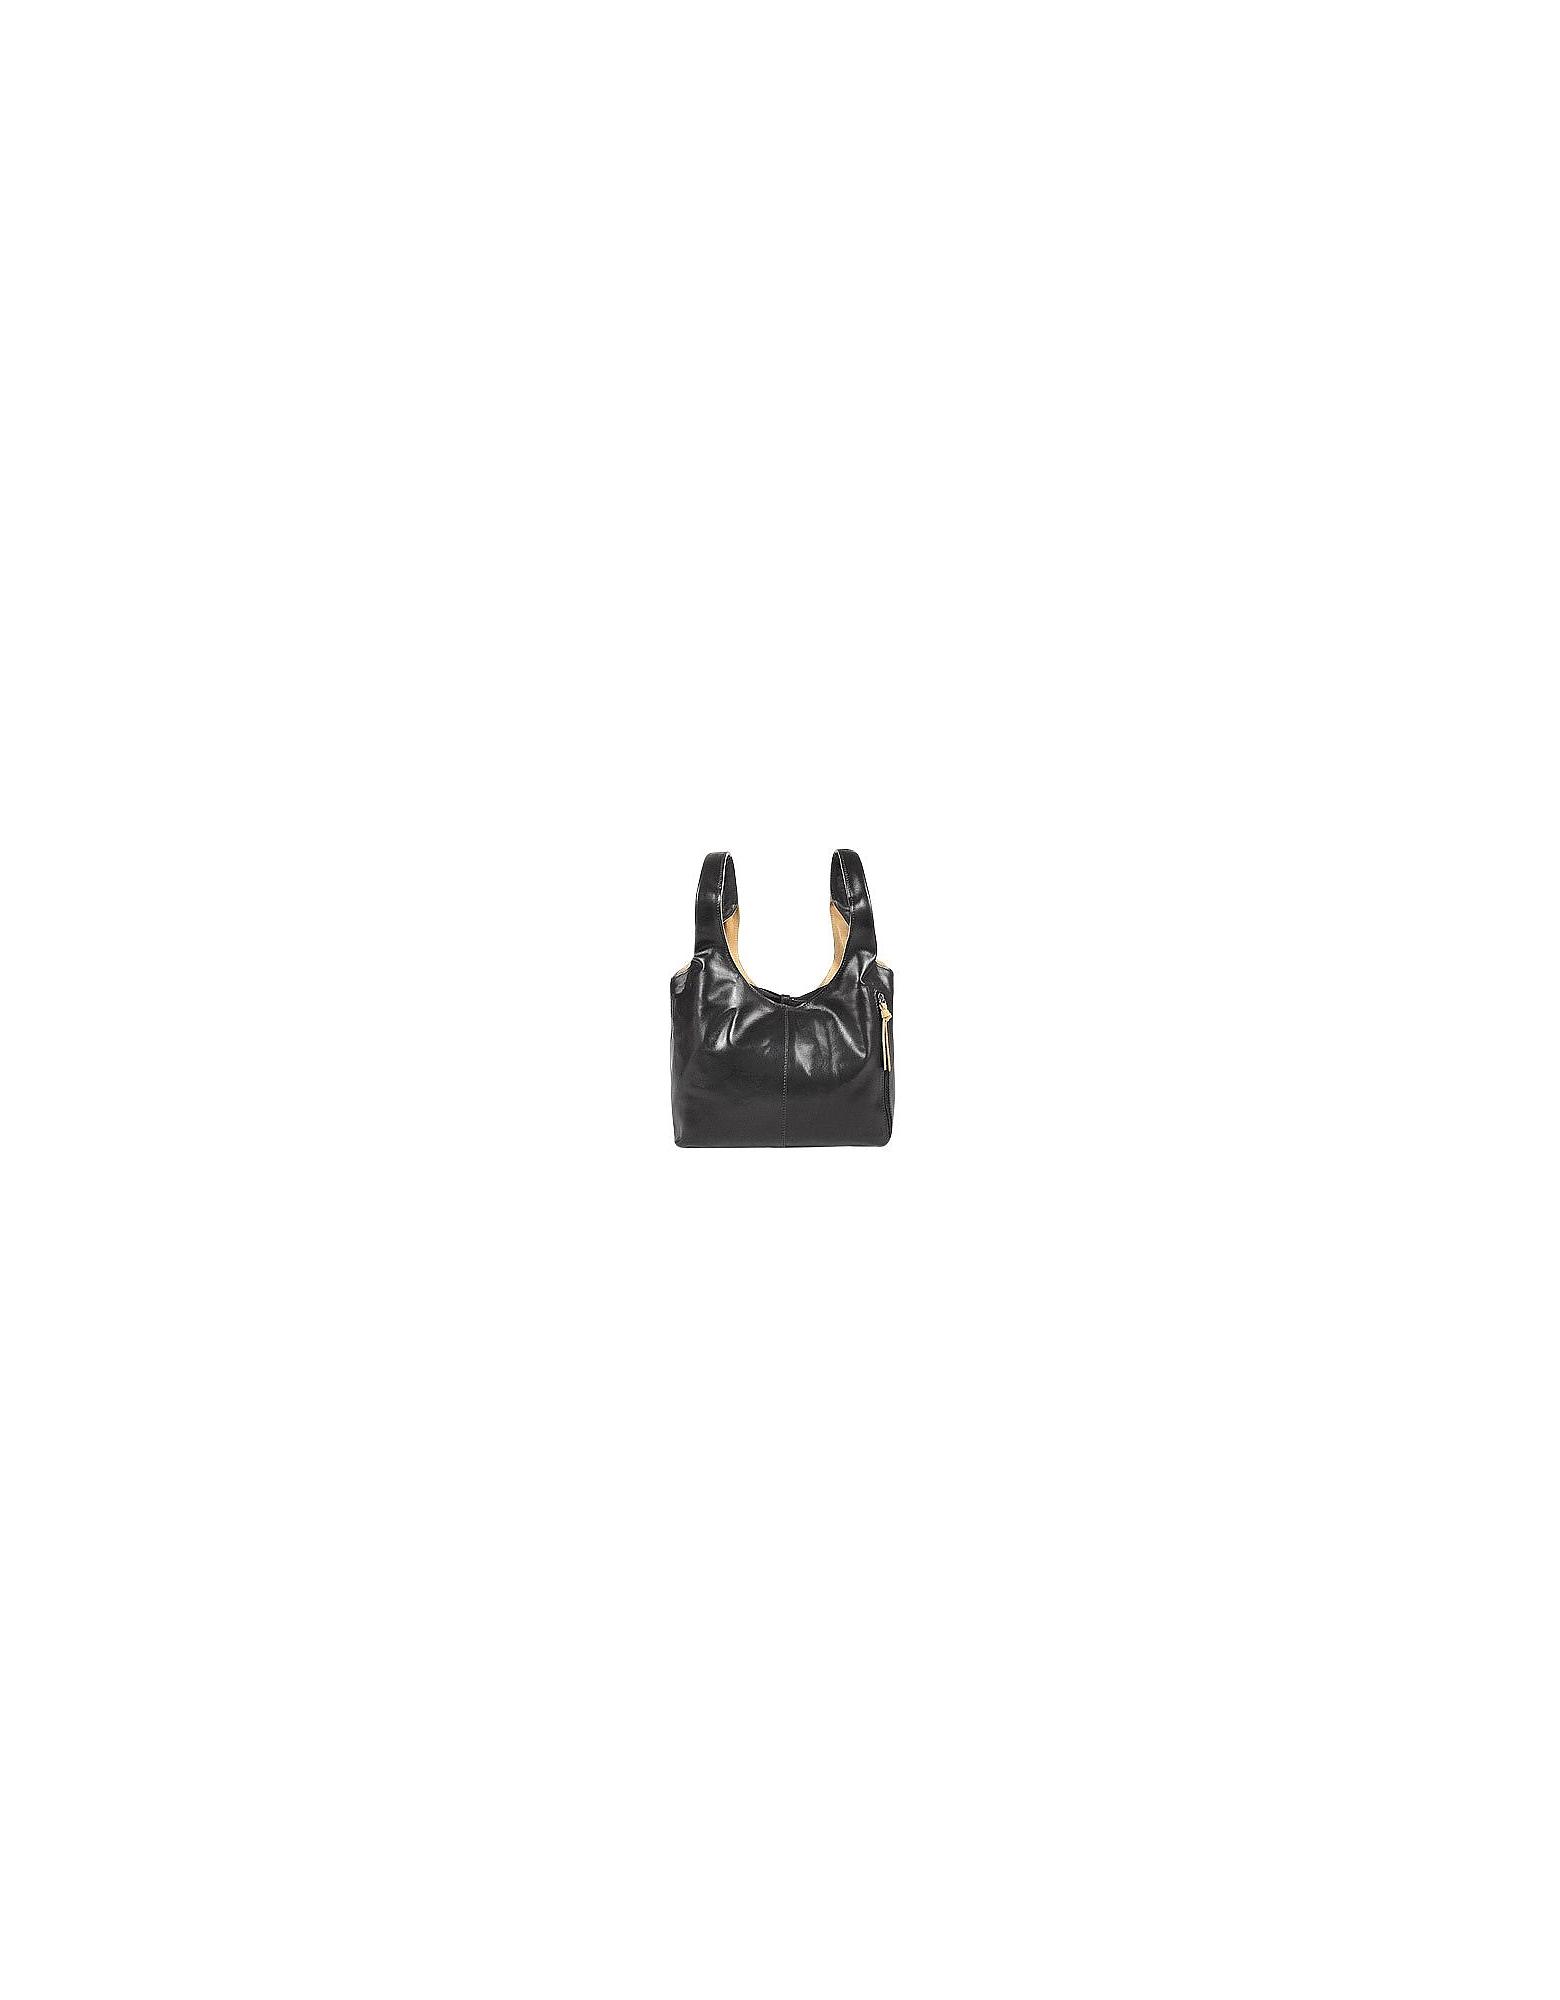 Fontanelli Handbags, Black & Tan Reversible Italian Leather Handbag